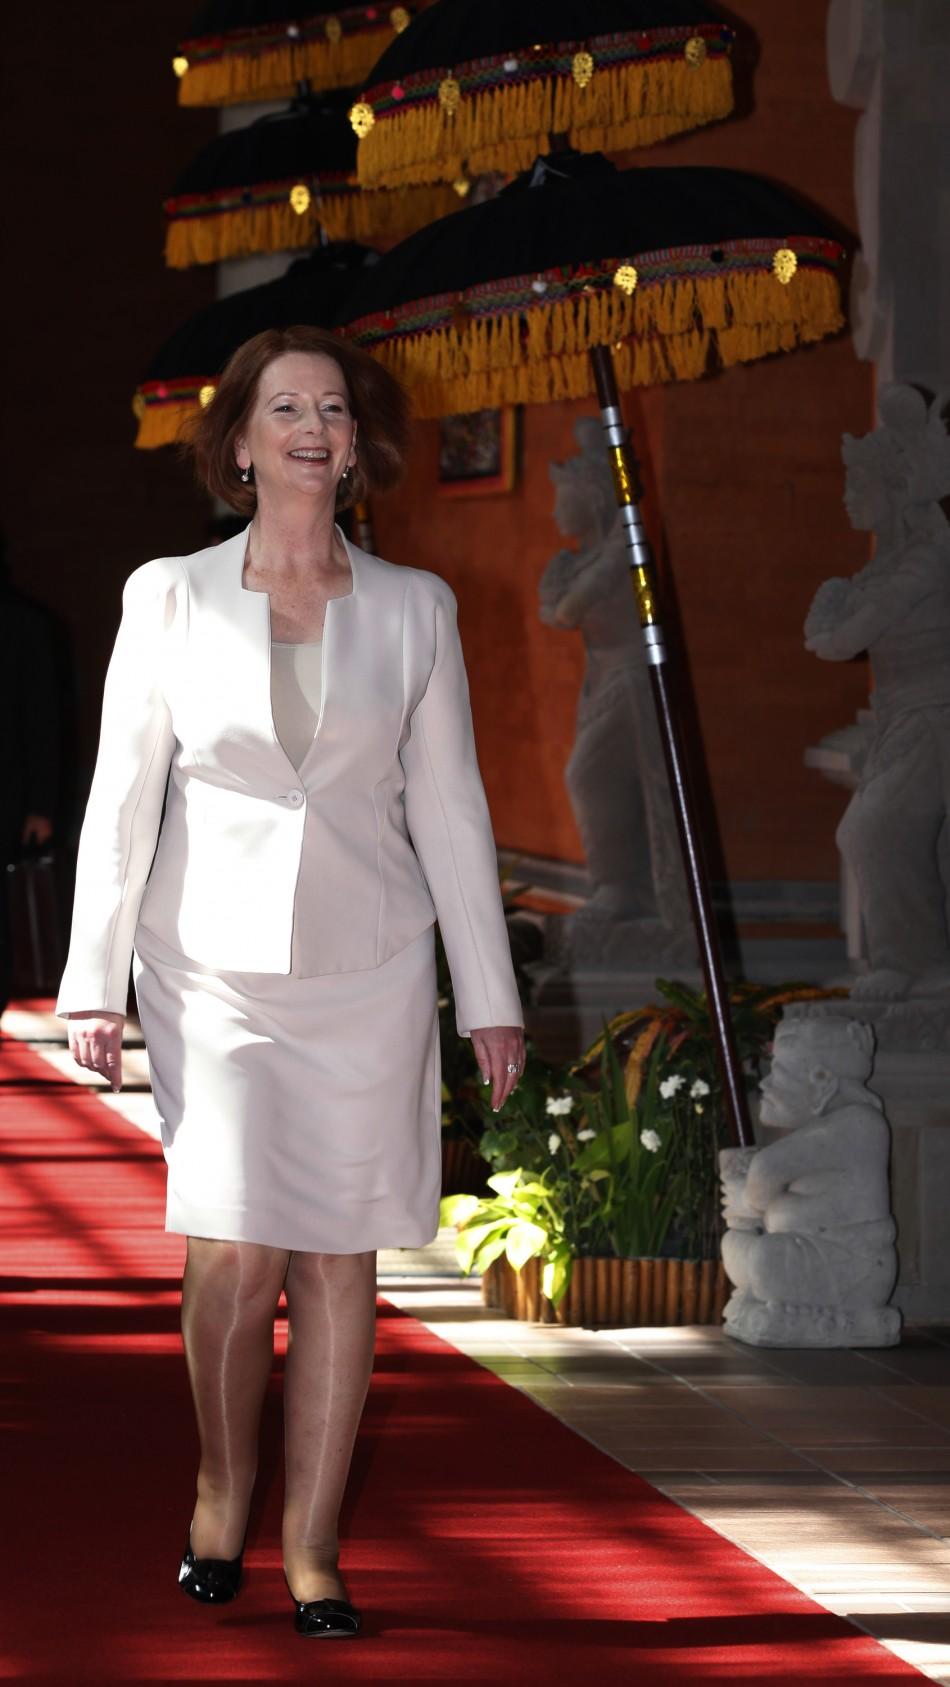 Australias Prime Minister Julia Gillard